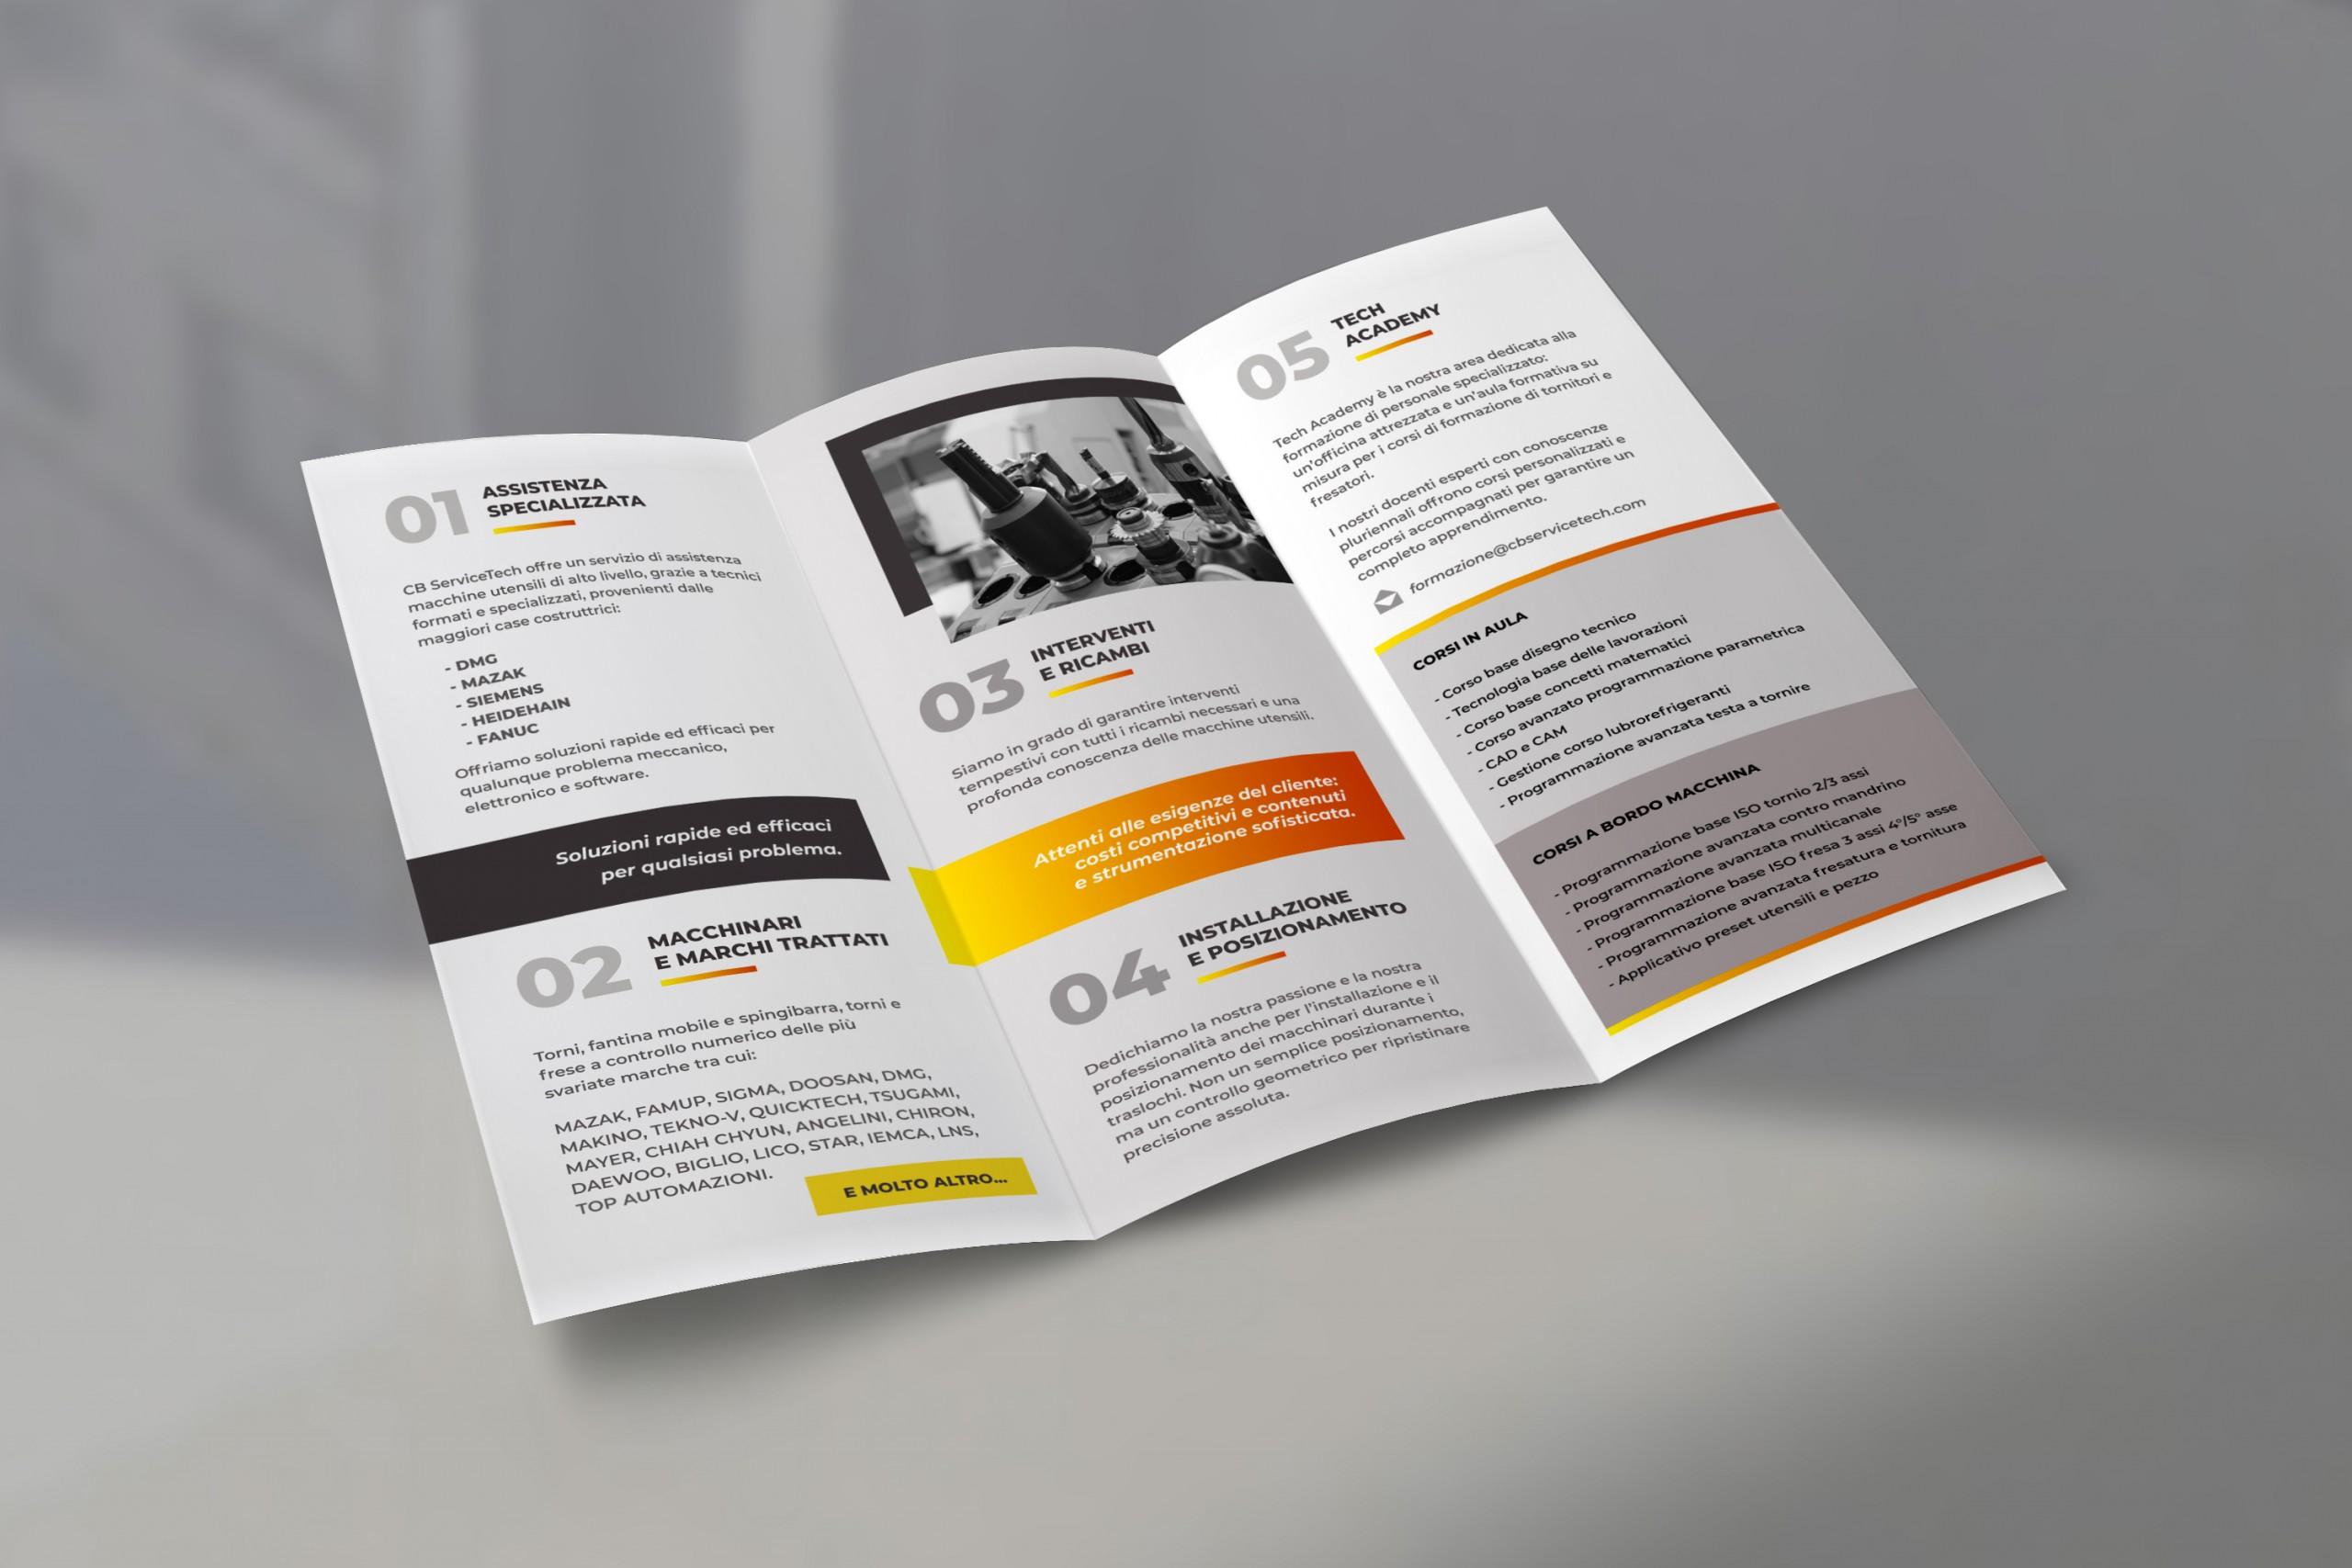 Luca Forlani Graphic Design CB ServiceTech img 3